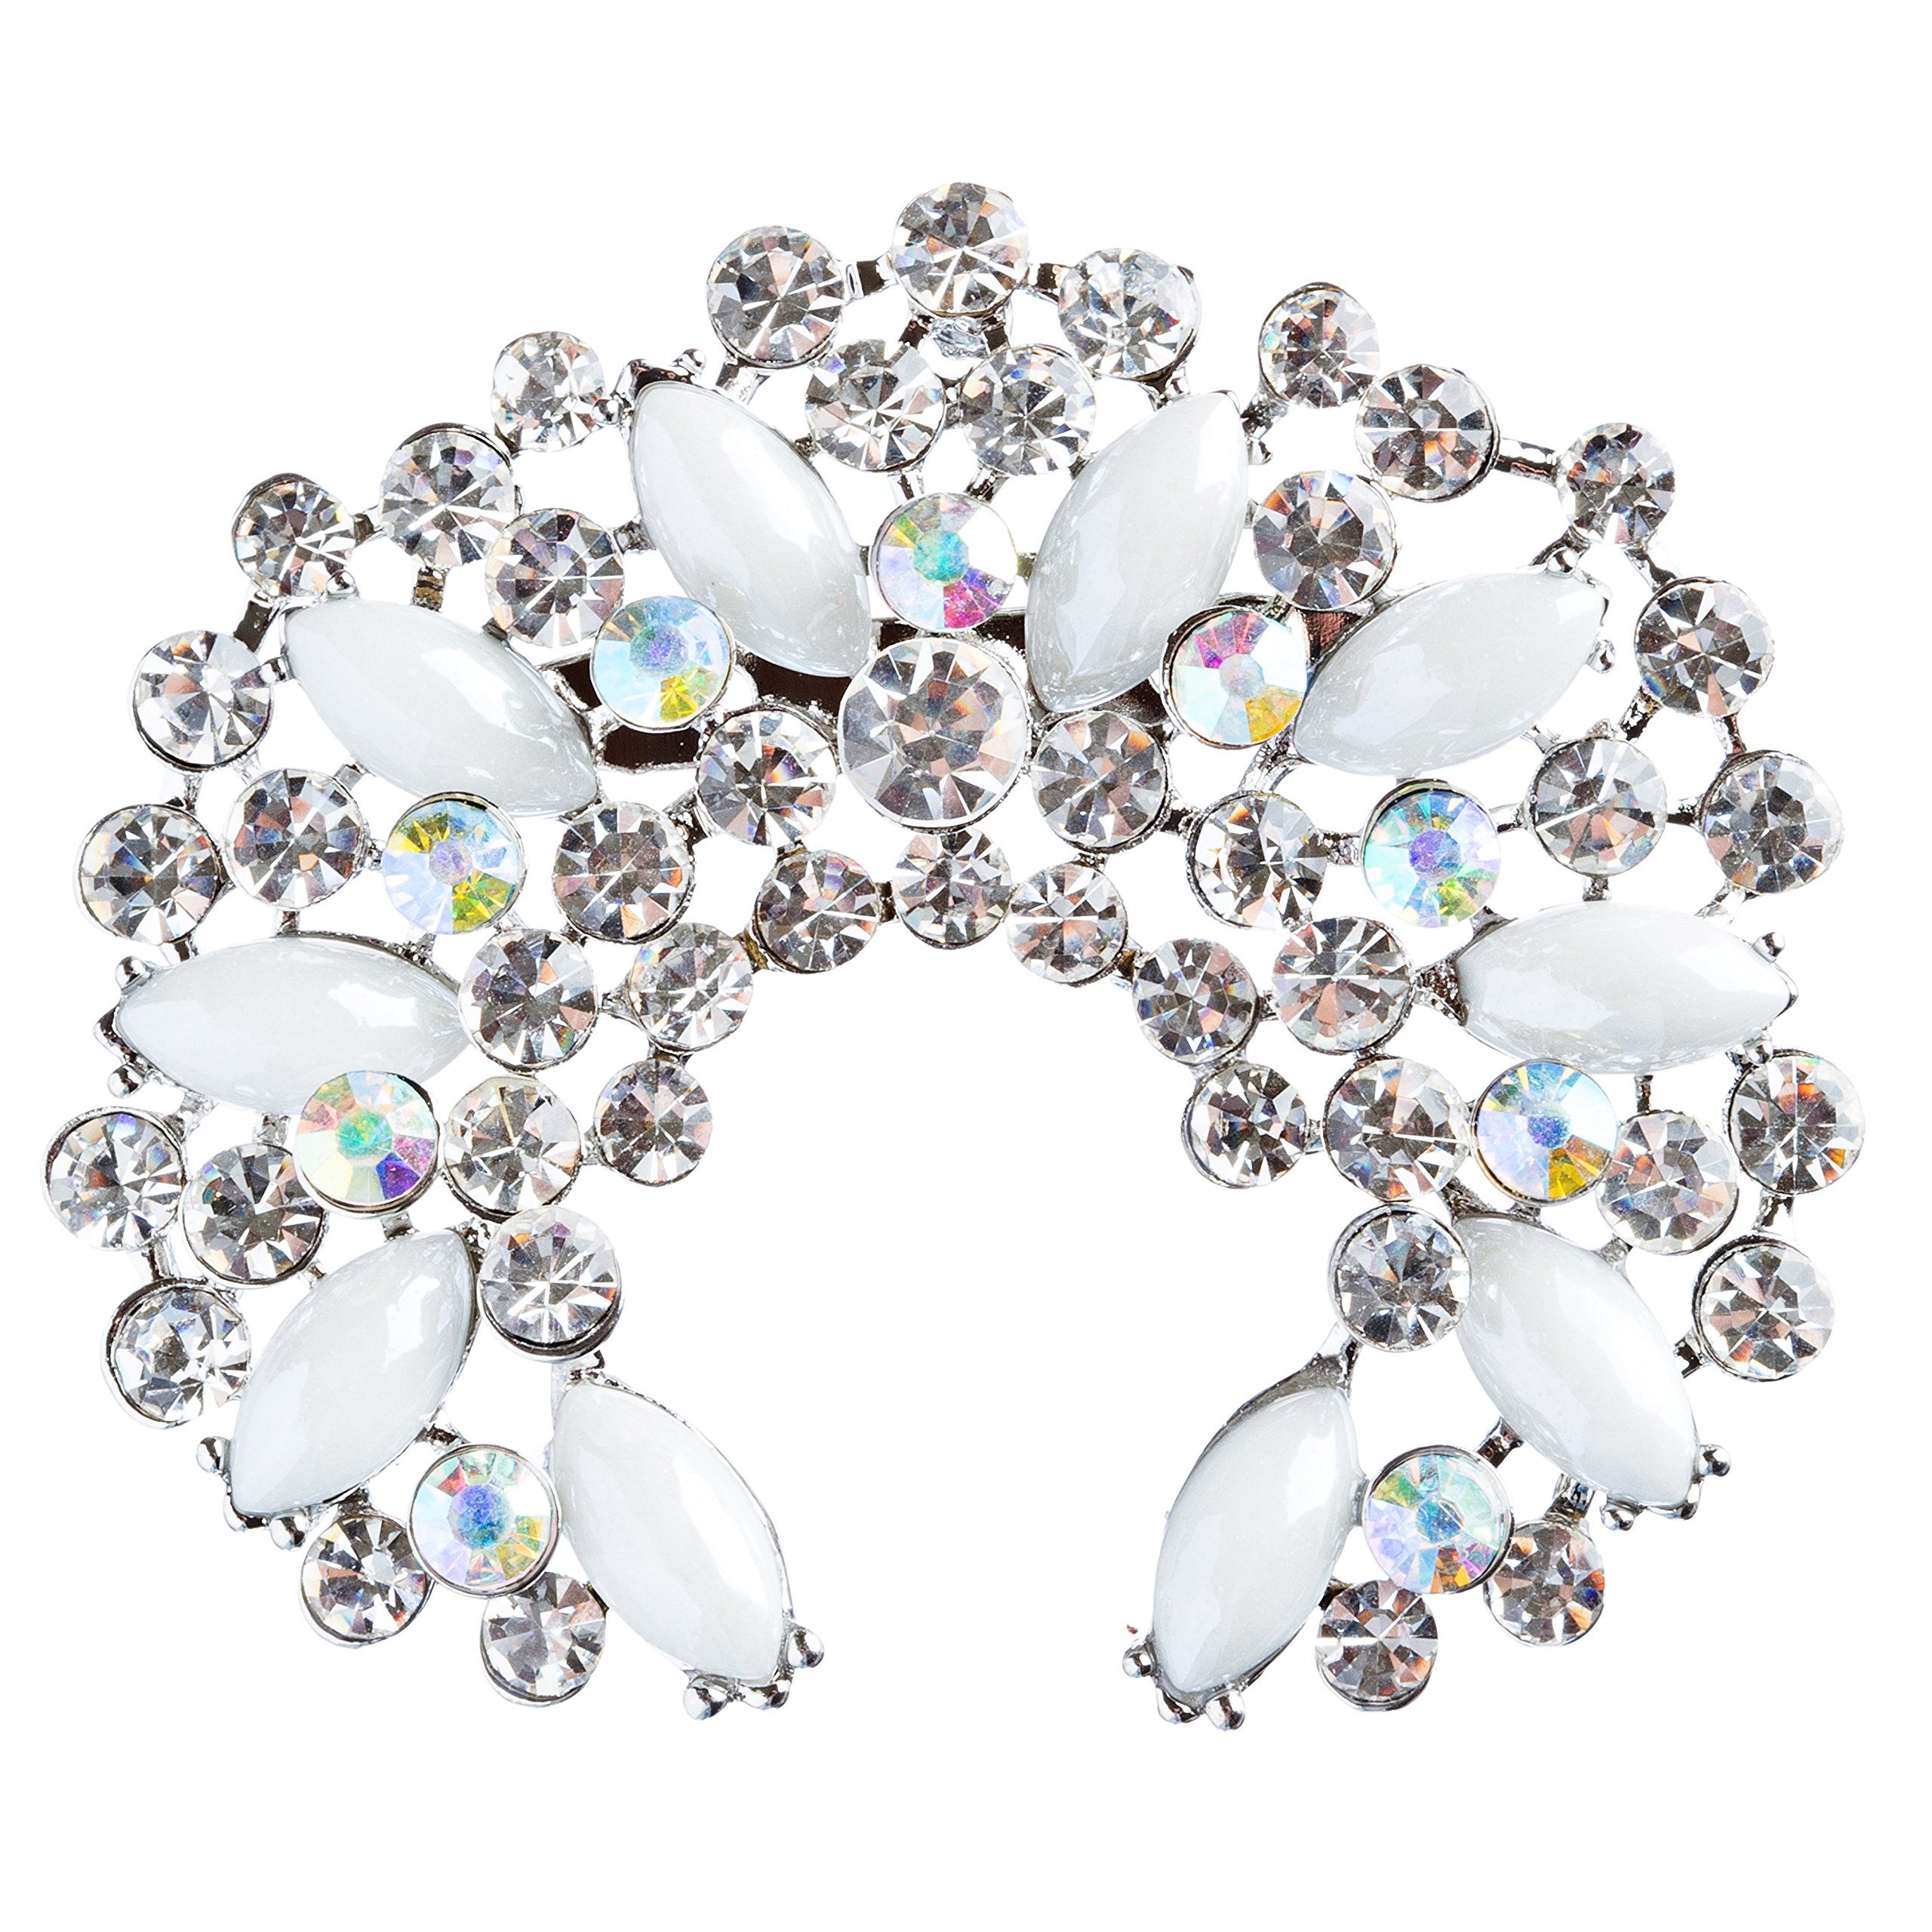 ACCESSORIESFOREVER Women Bridal Wedding Jewelry Crystal Rhinestone Crescent Brooch Pin BH174 Silver